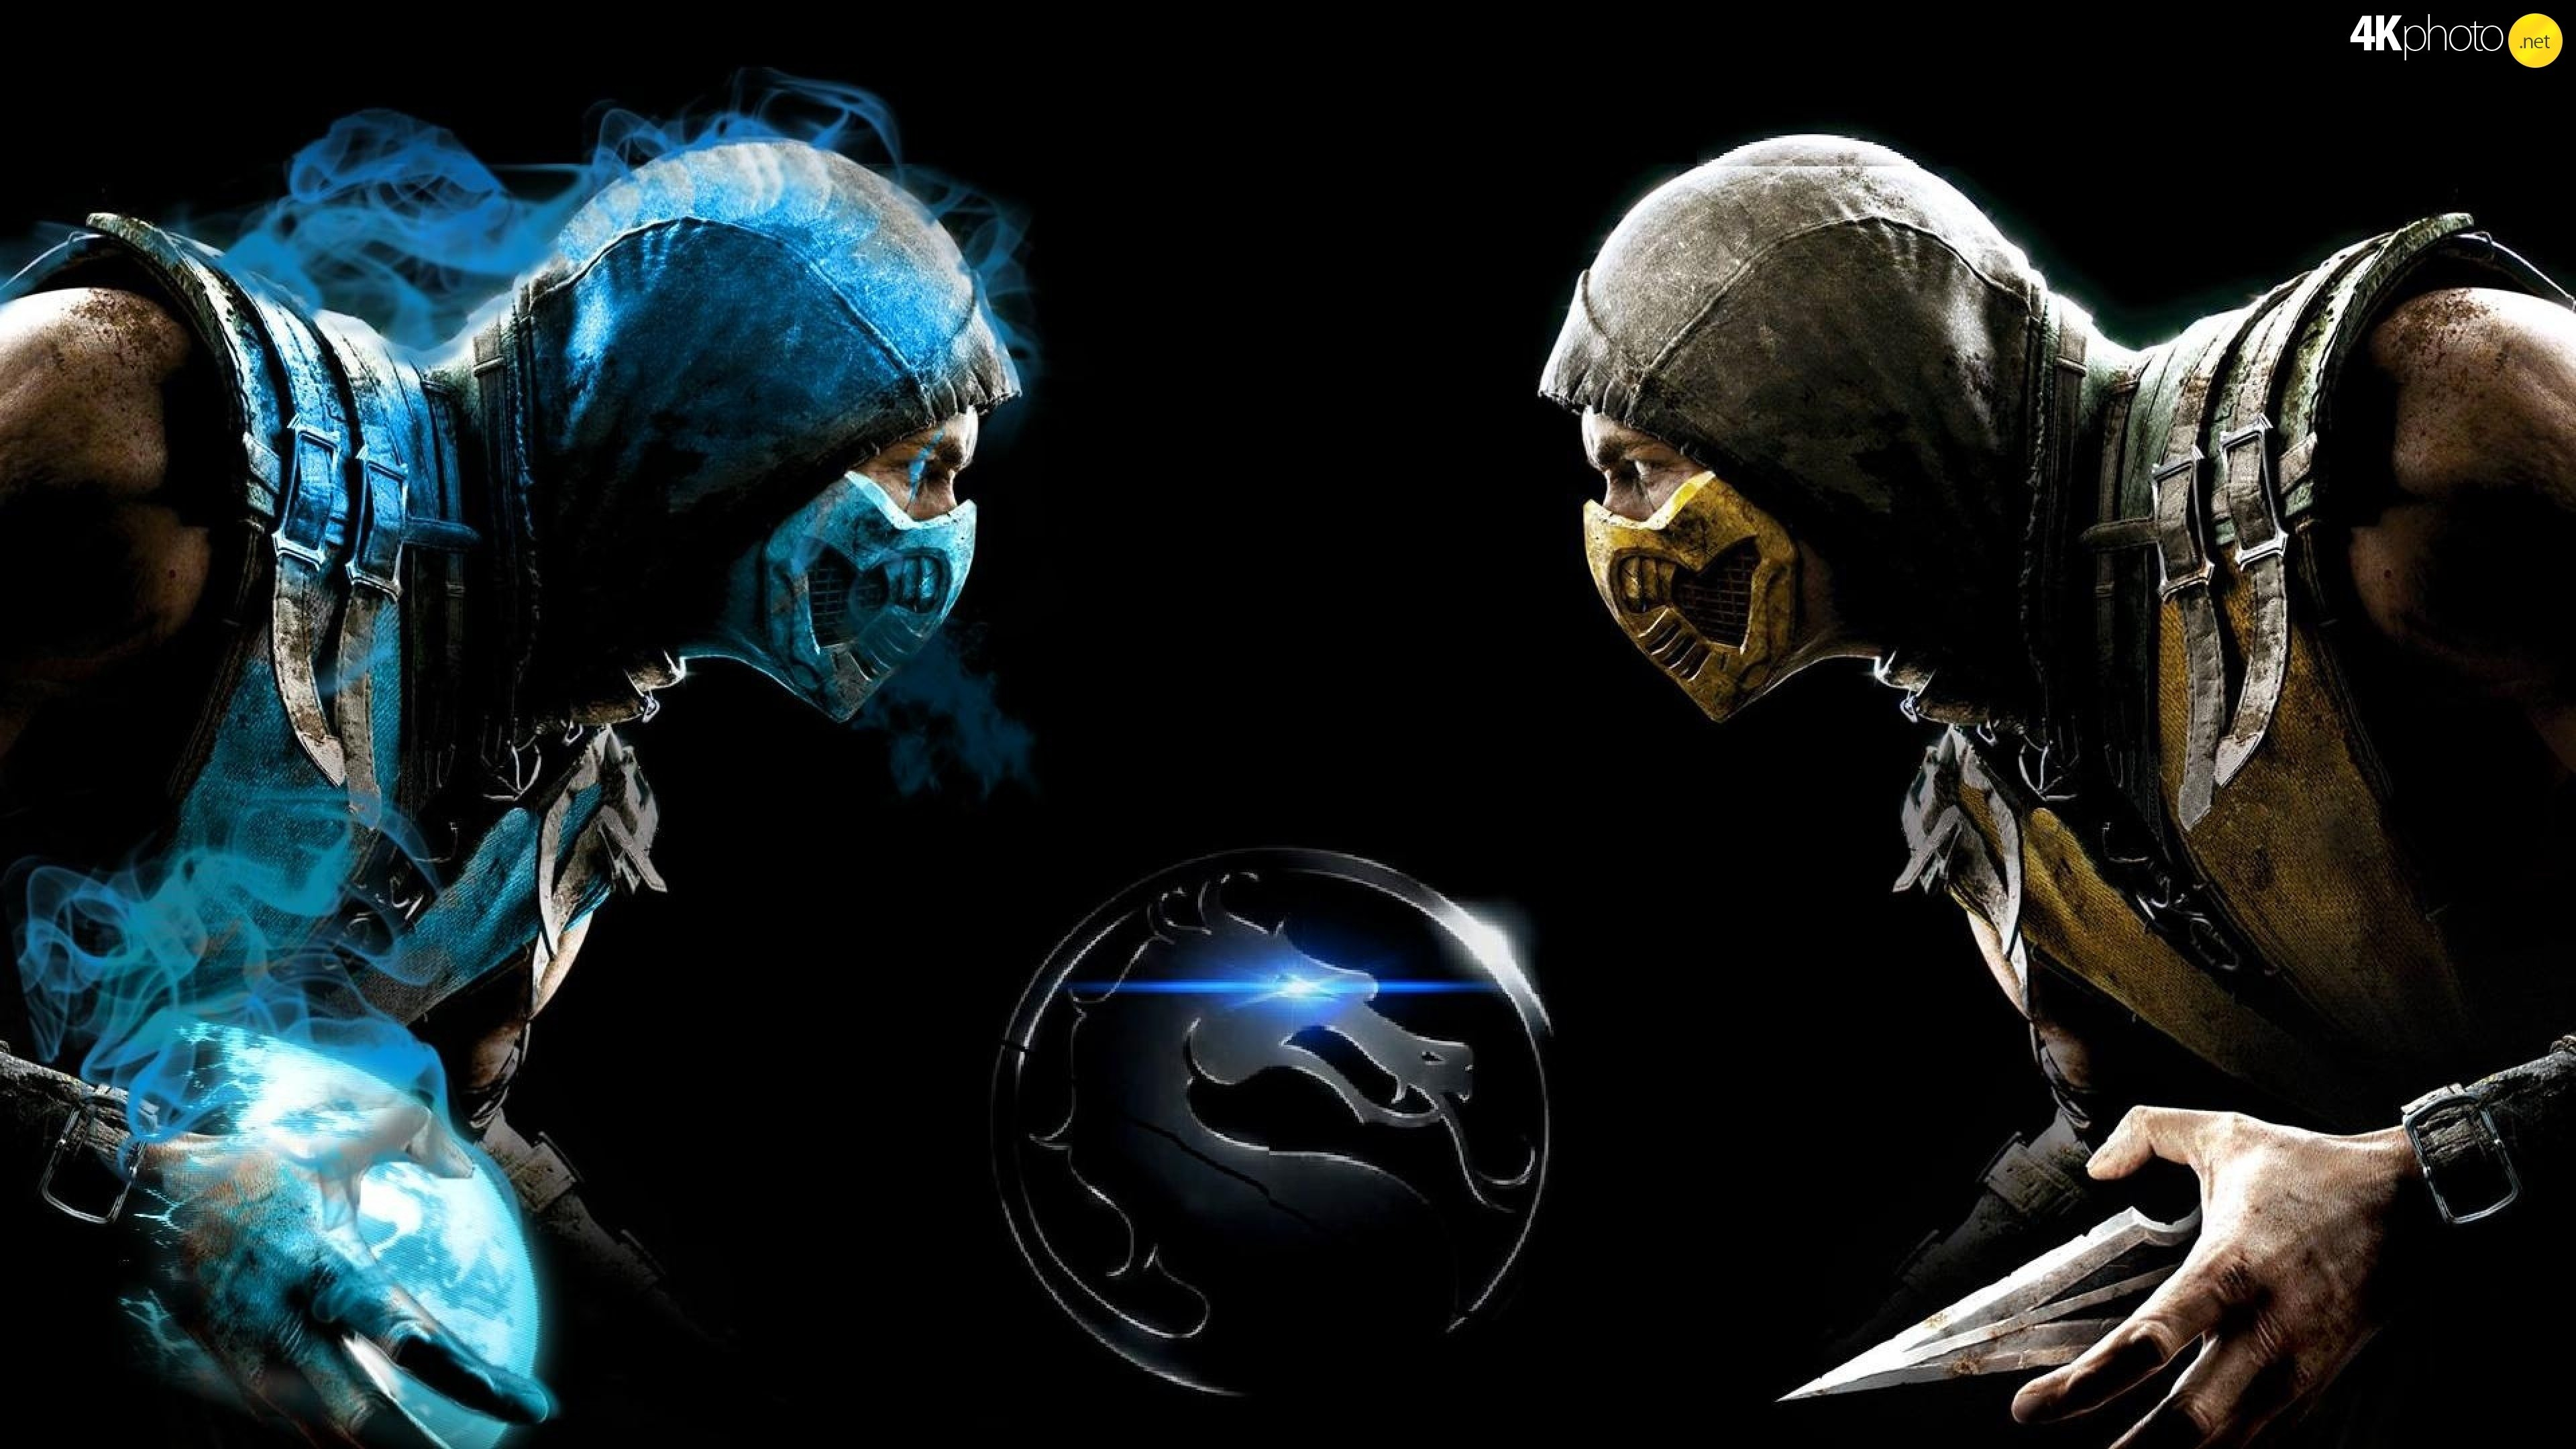 Mortal Kombat X Scorpion Wallpaper 74 Images